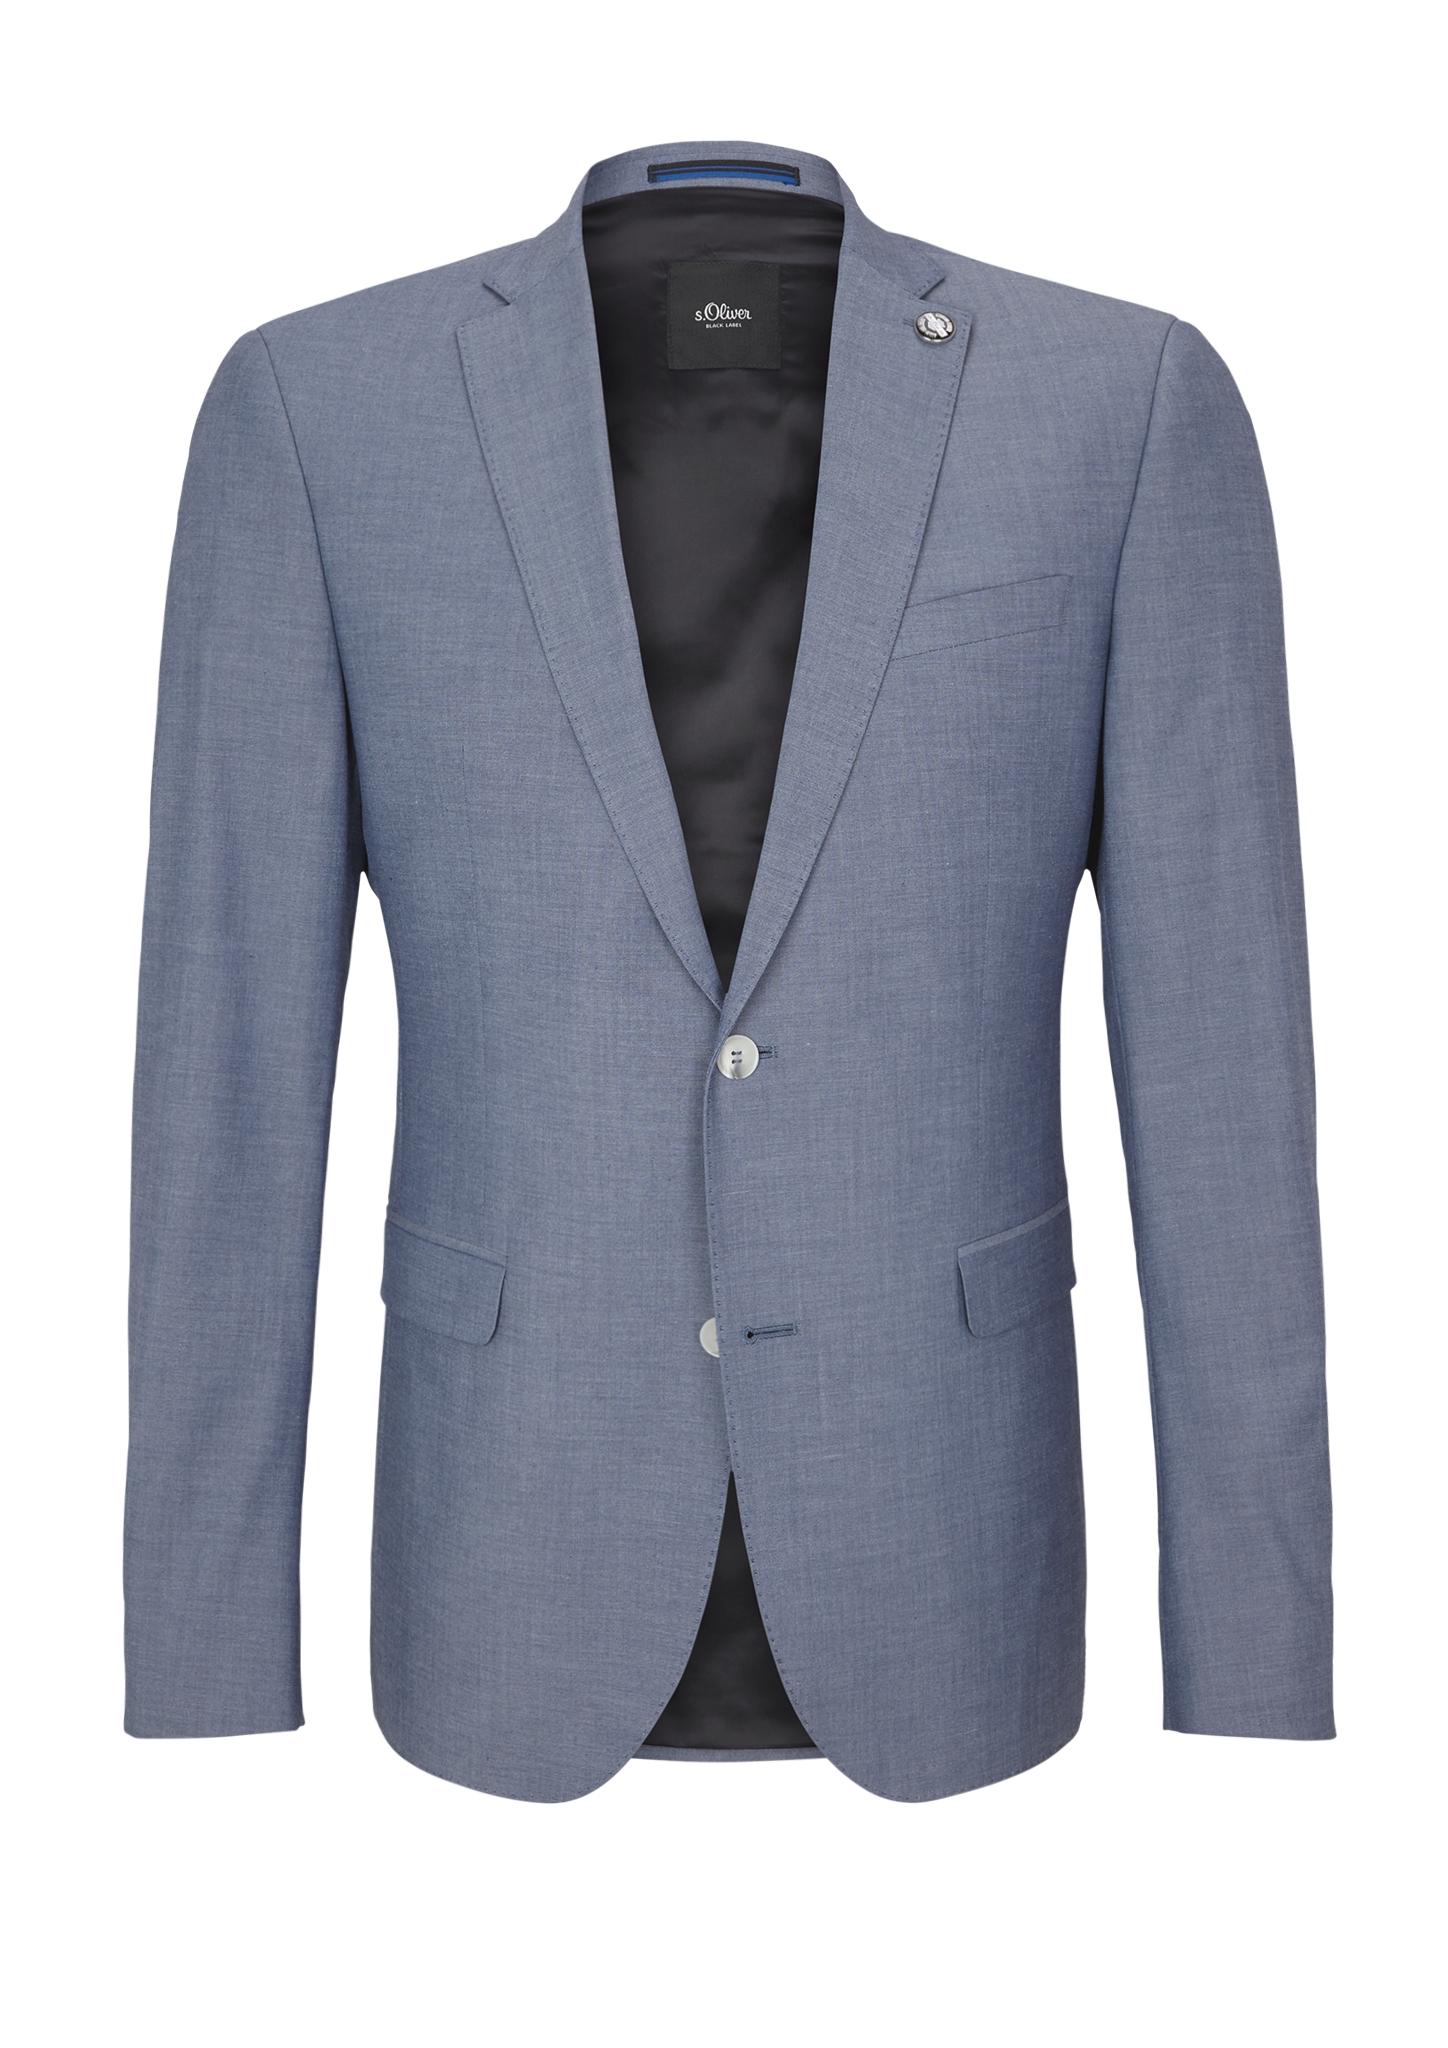 Sakko | Bekleidung > Sakkos > Sonstige Sakkos | Blau | Oberstoff: 65% polyester -  32% viskose -  3% elasthan| futter: 100% polyester | s.Oliver BLACK LABEL